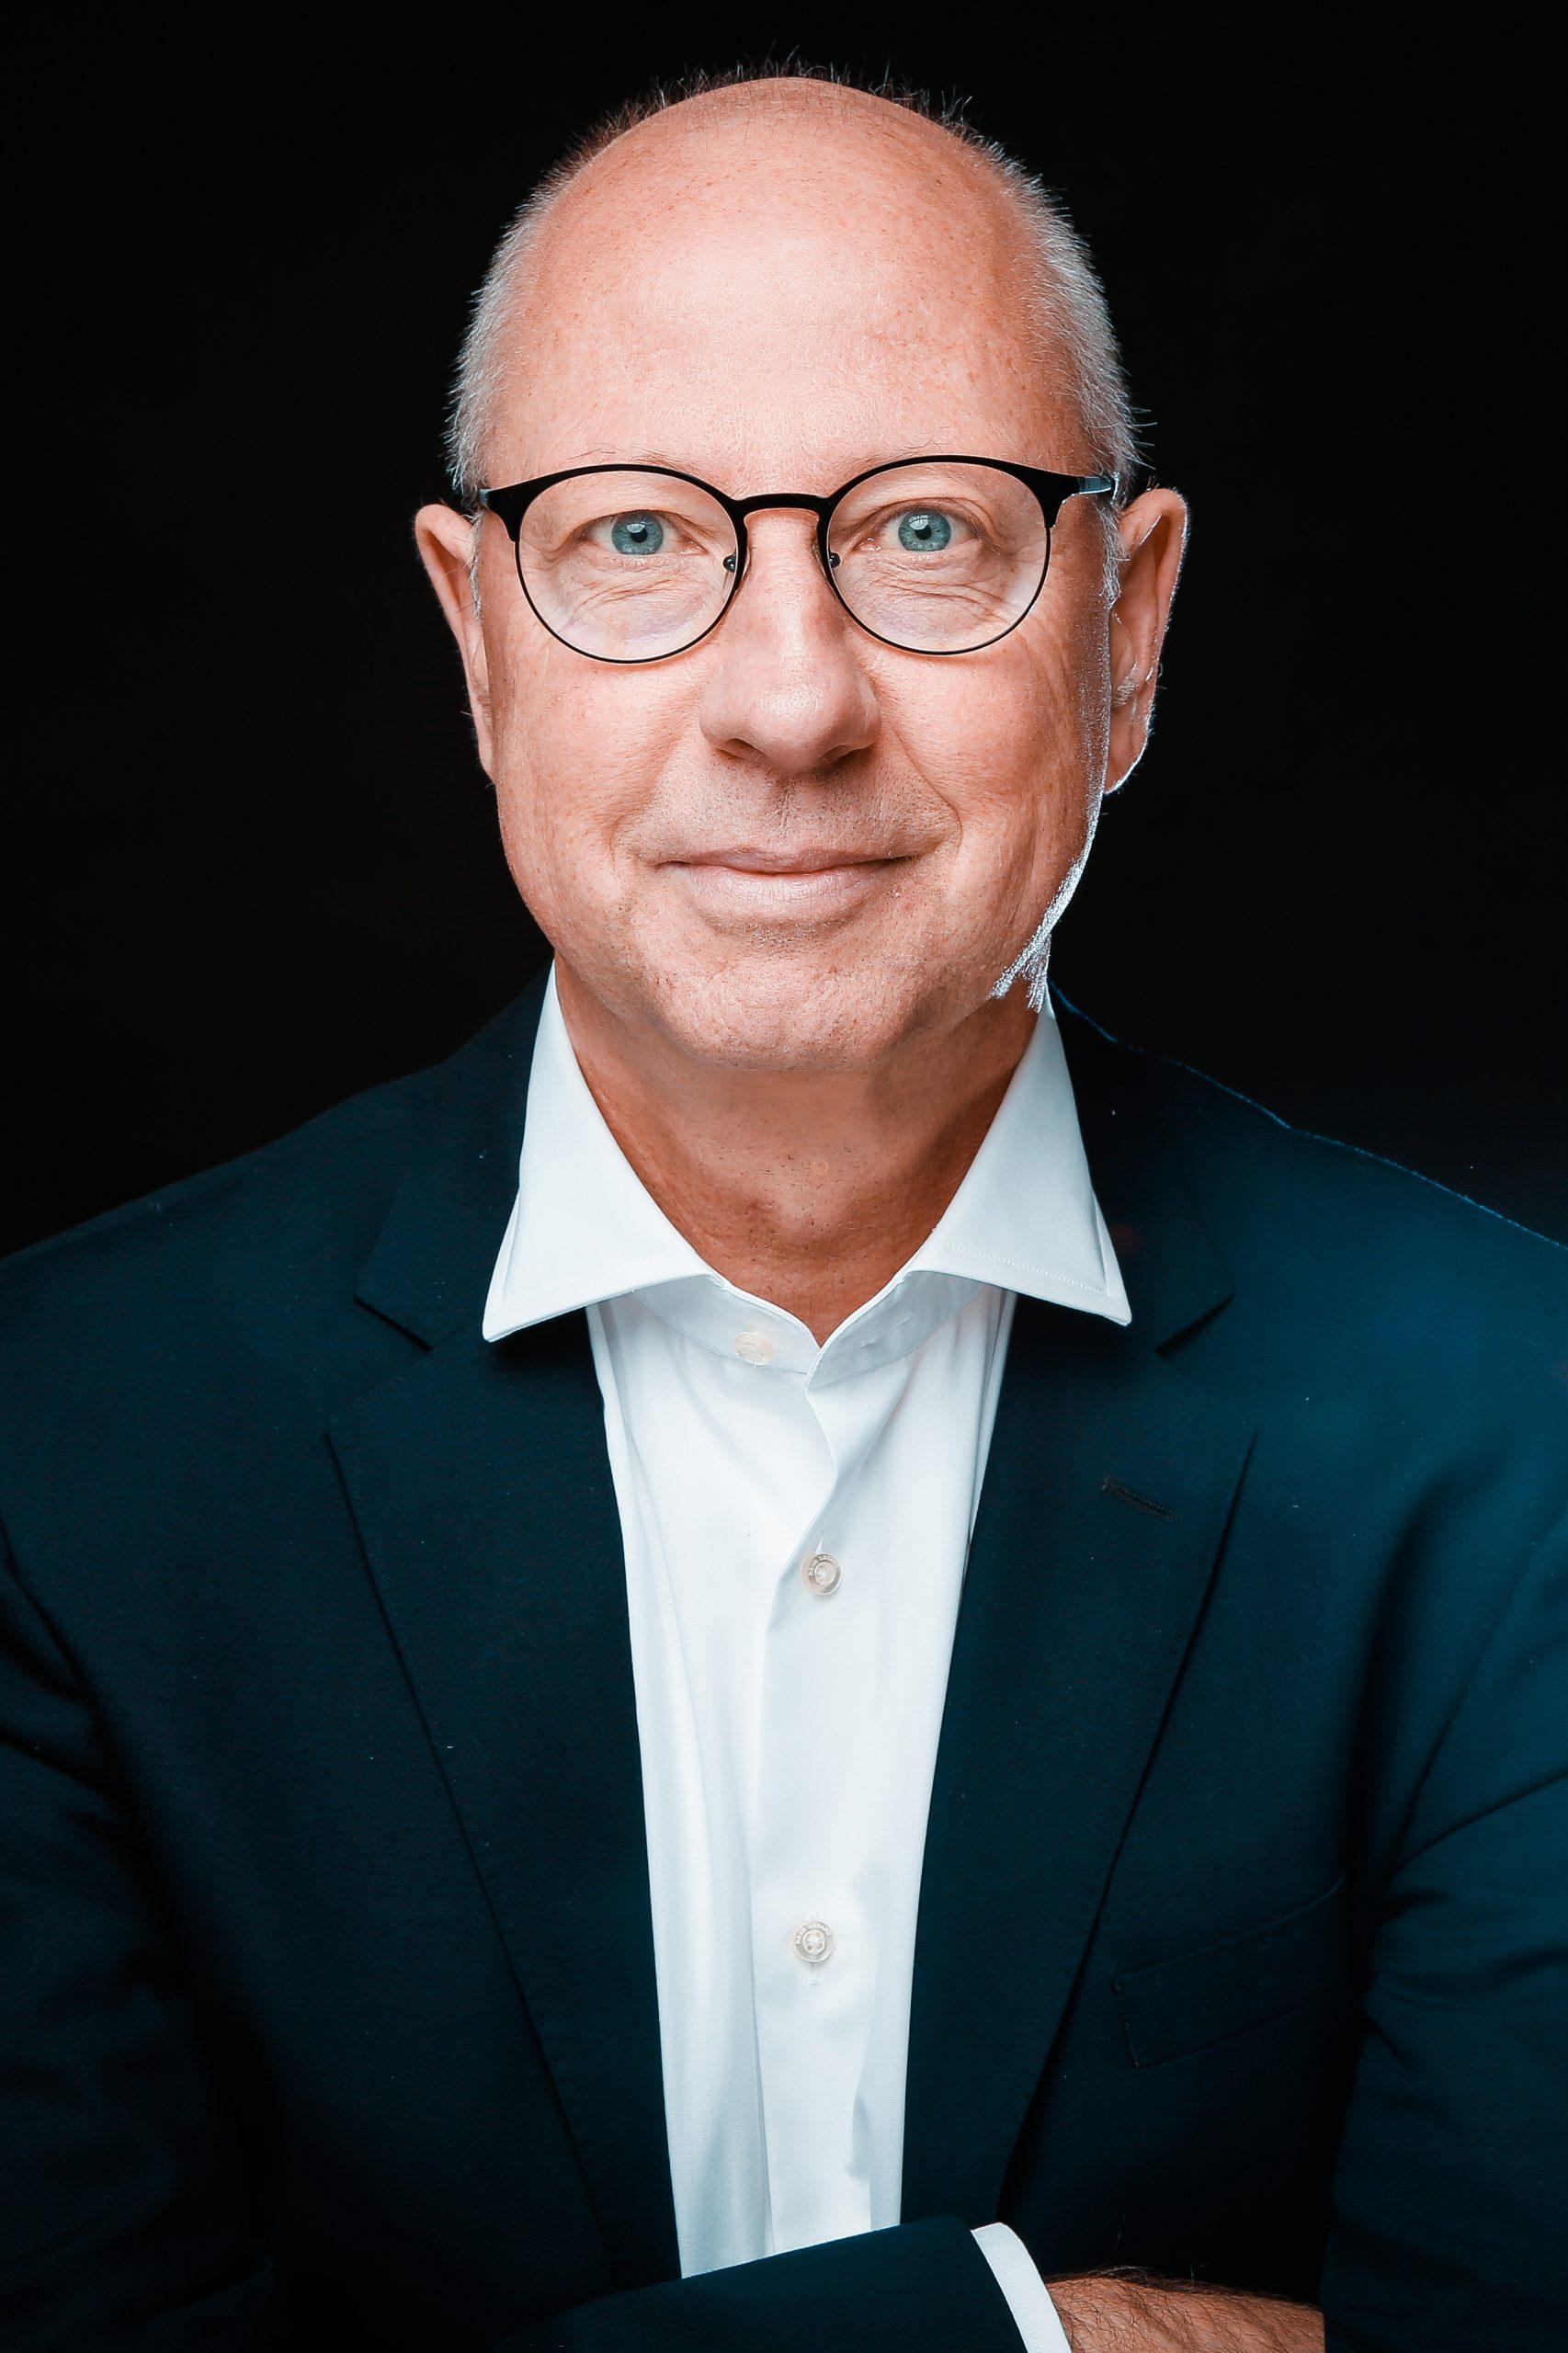 Thomas Horster-Möller Fotoshooting Familie Horster 23.05.2019